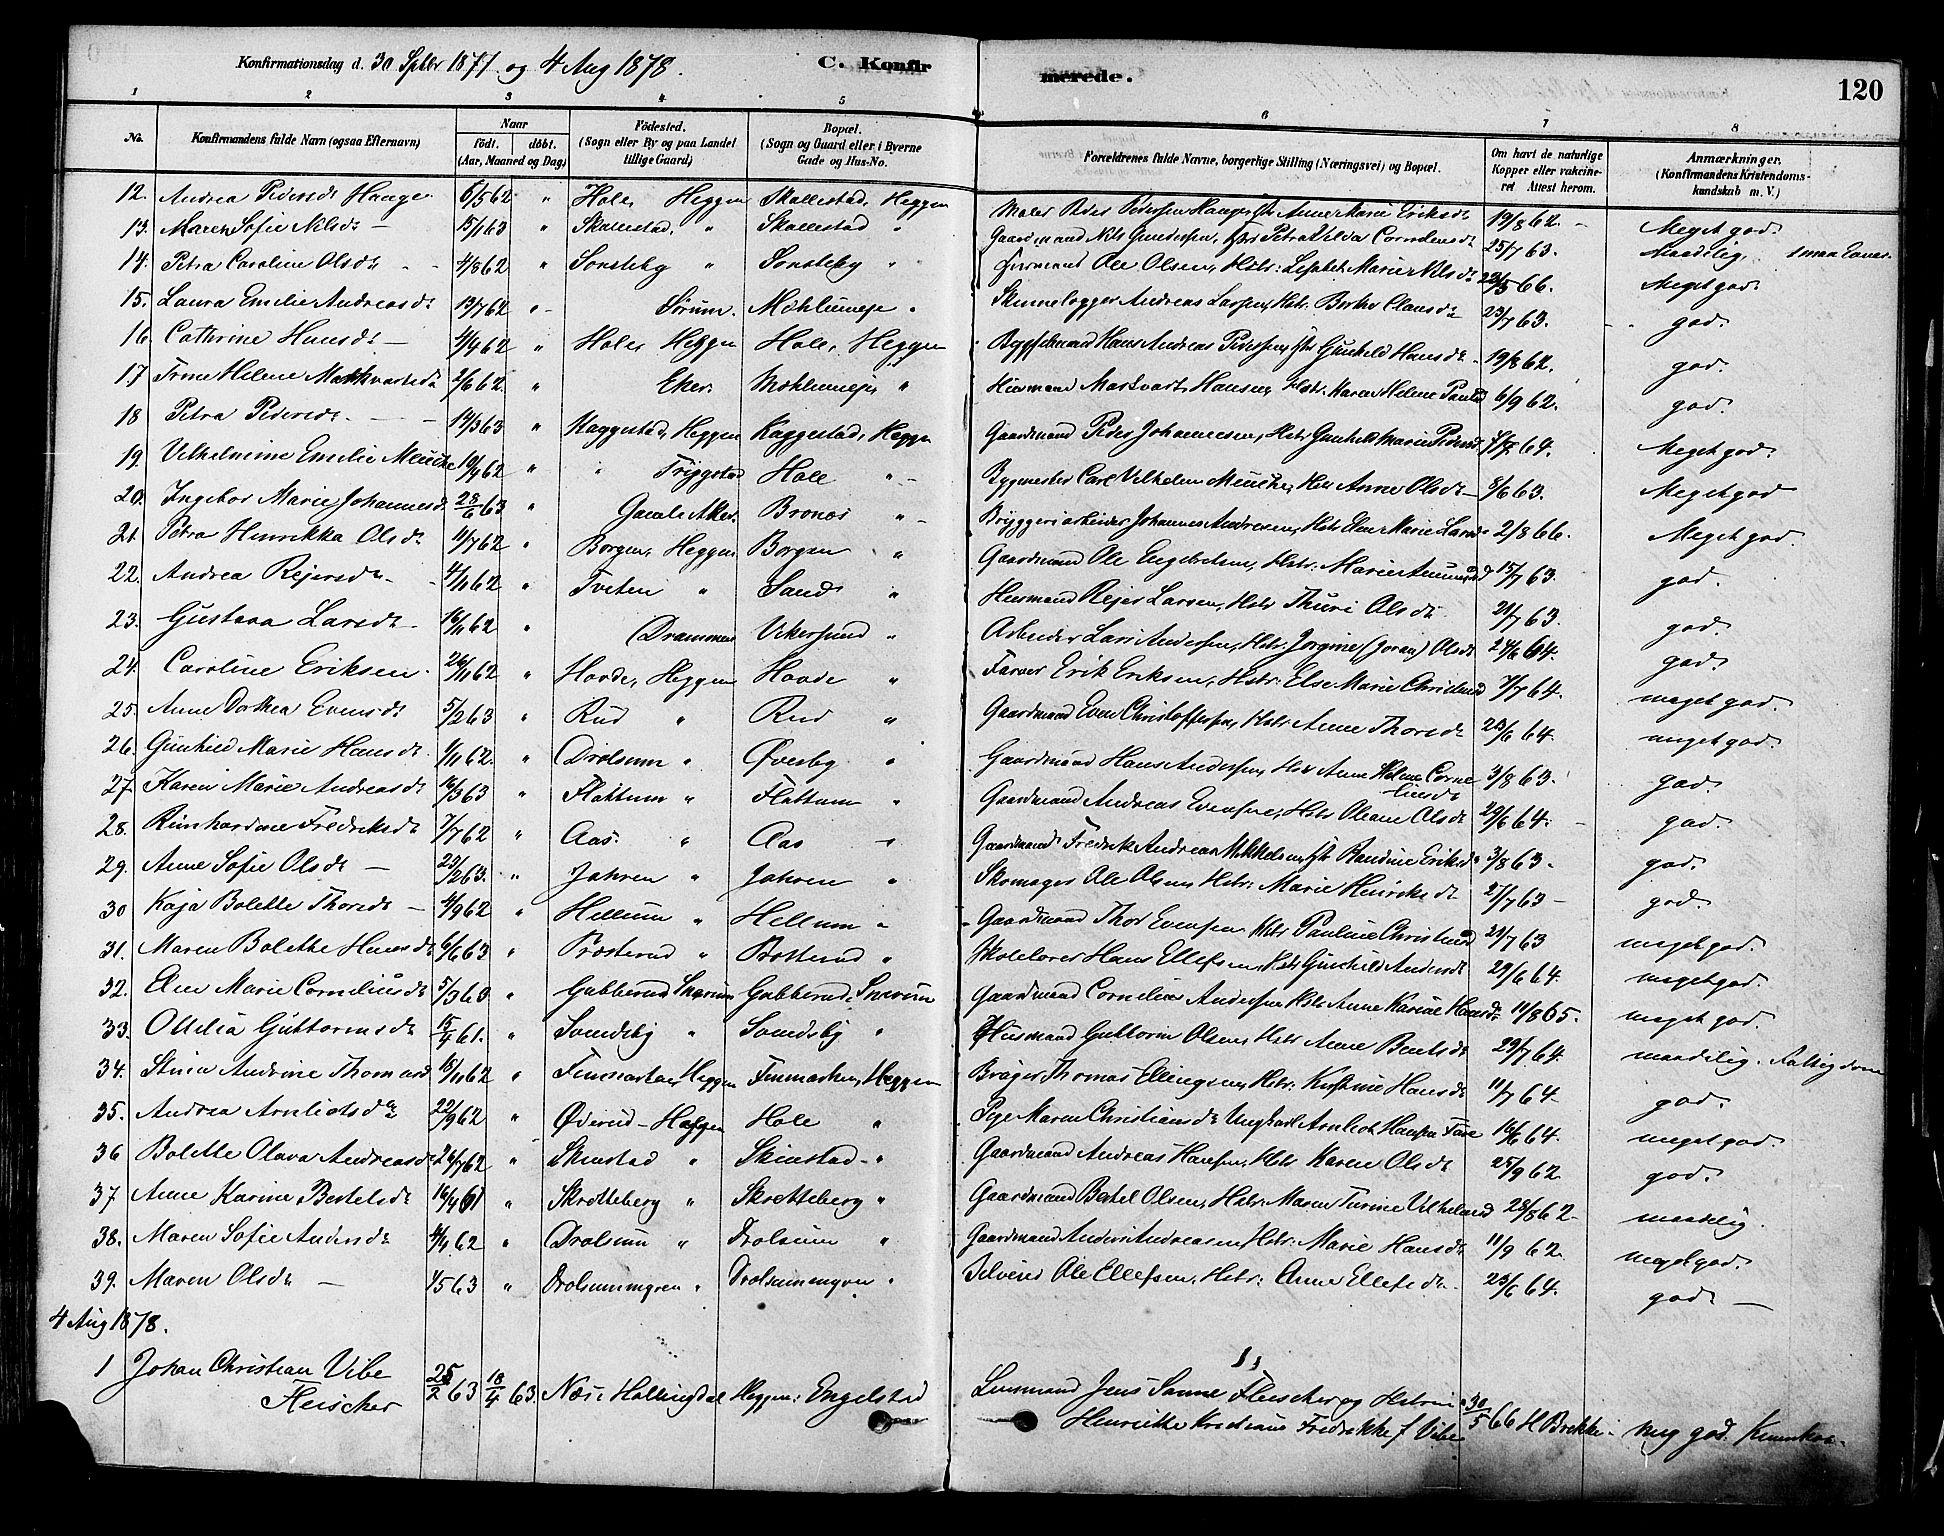 SAKO, Modum kirkebøker, F/Fa/L0011: Ministerialbok nr. 11, 1877-1889, s. 120